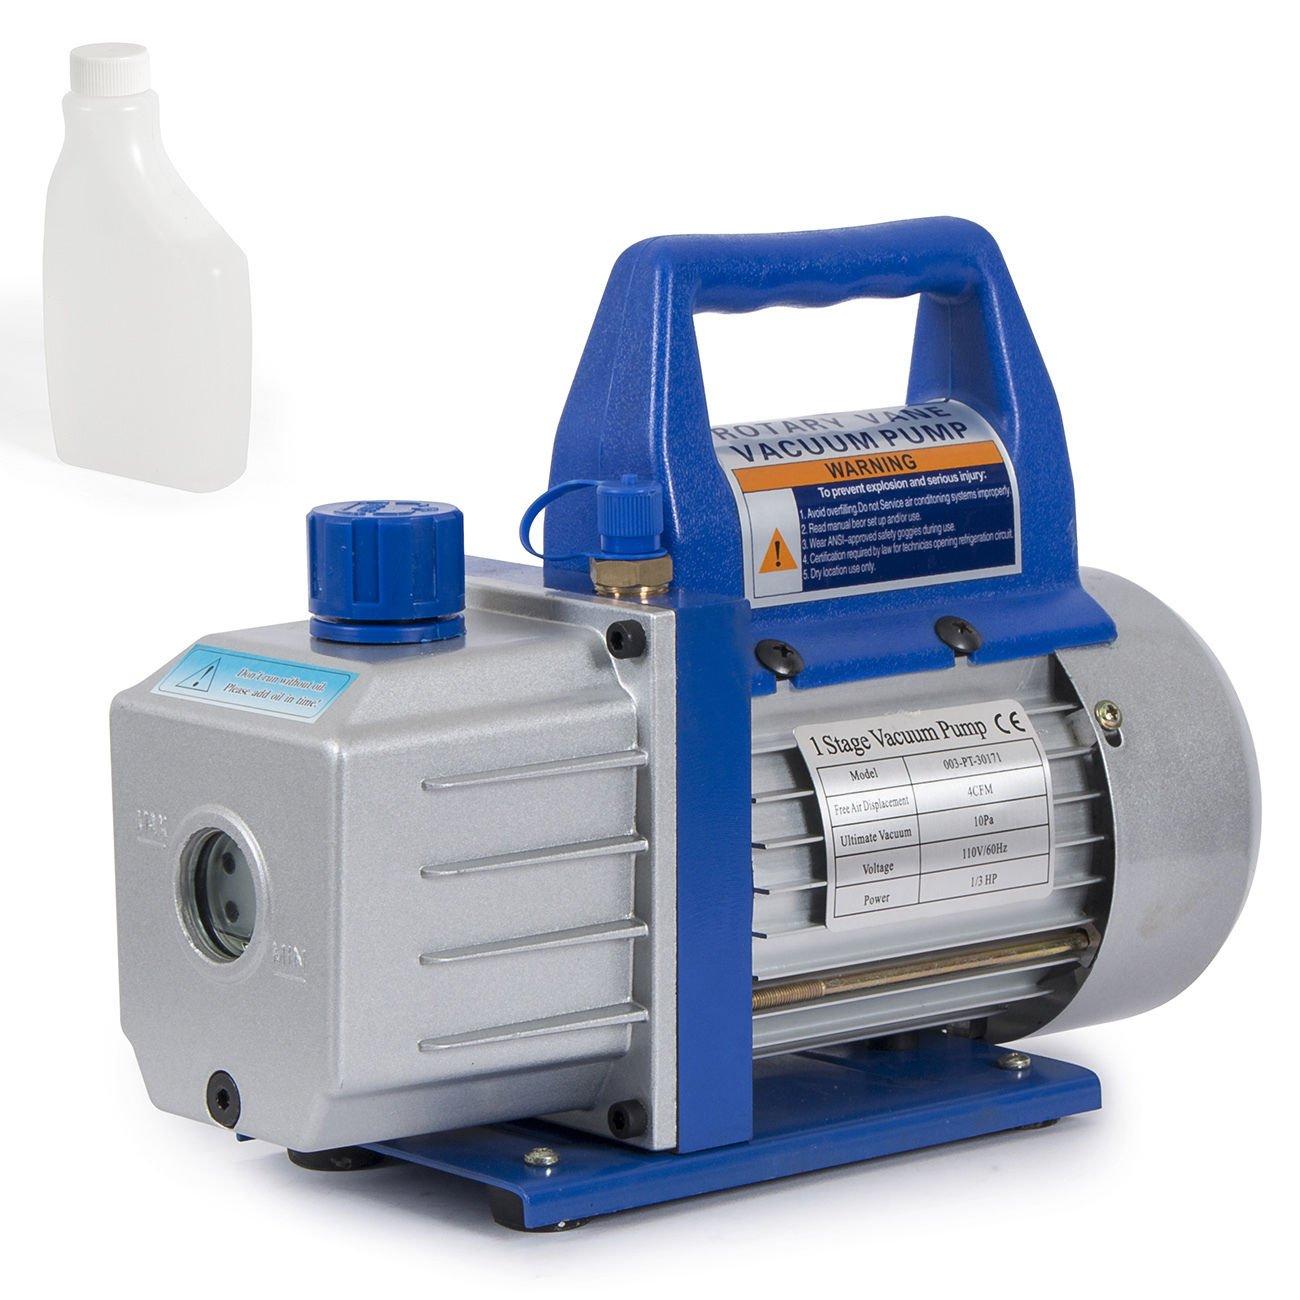 4CFM Rotary Vane Deep Vacuum Pump 1/3HP AC Air Tool R410a R134 HVAC Refrigerant Bonus free ebook By Allgoodsdelight365